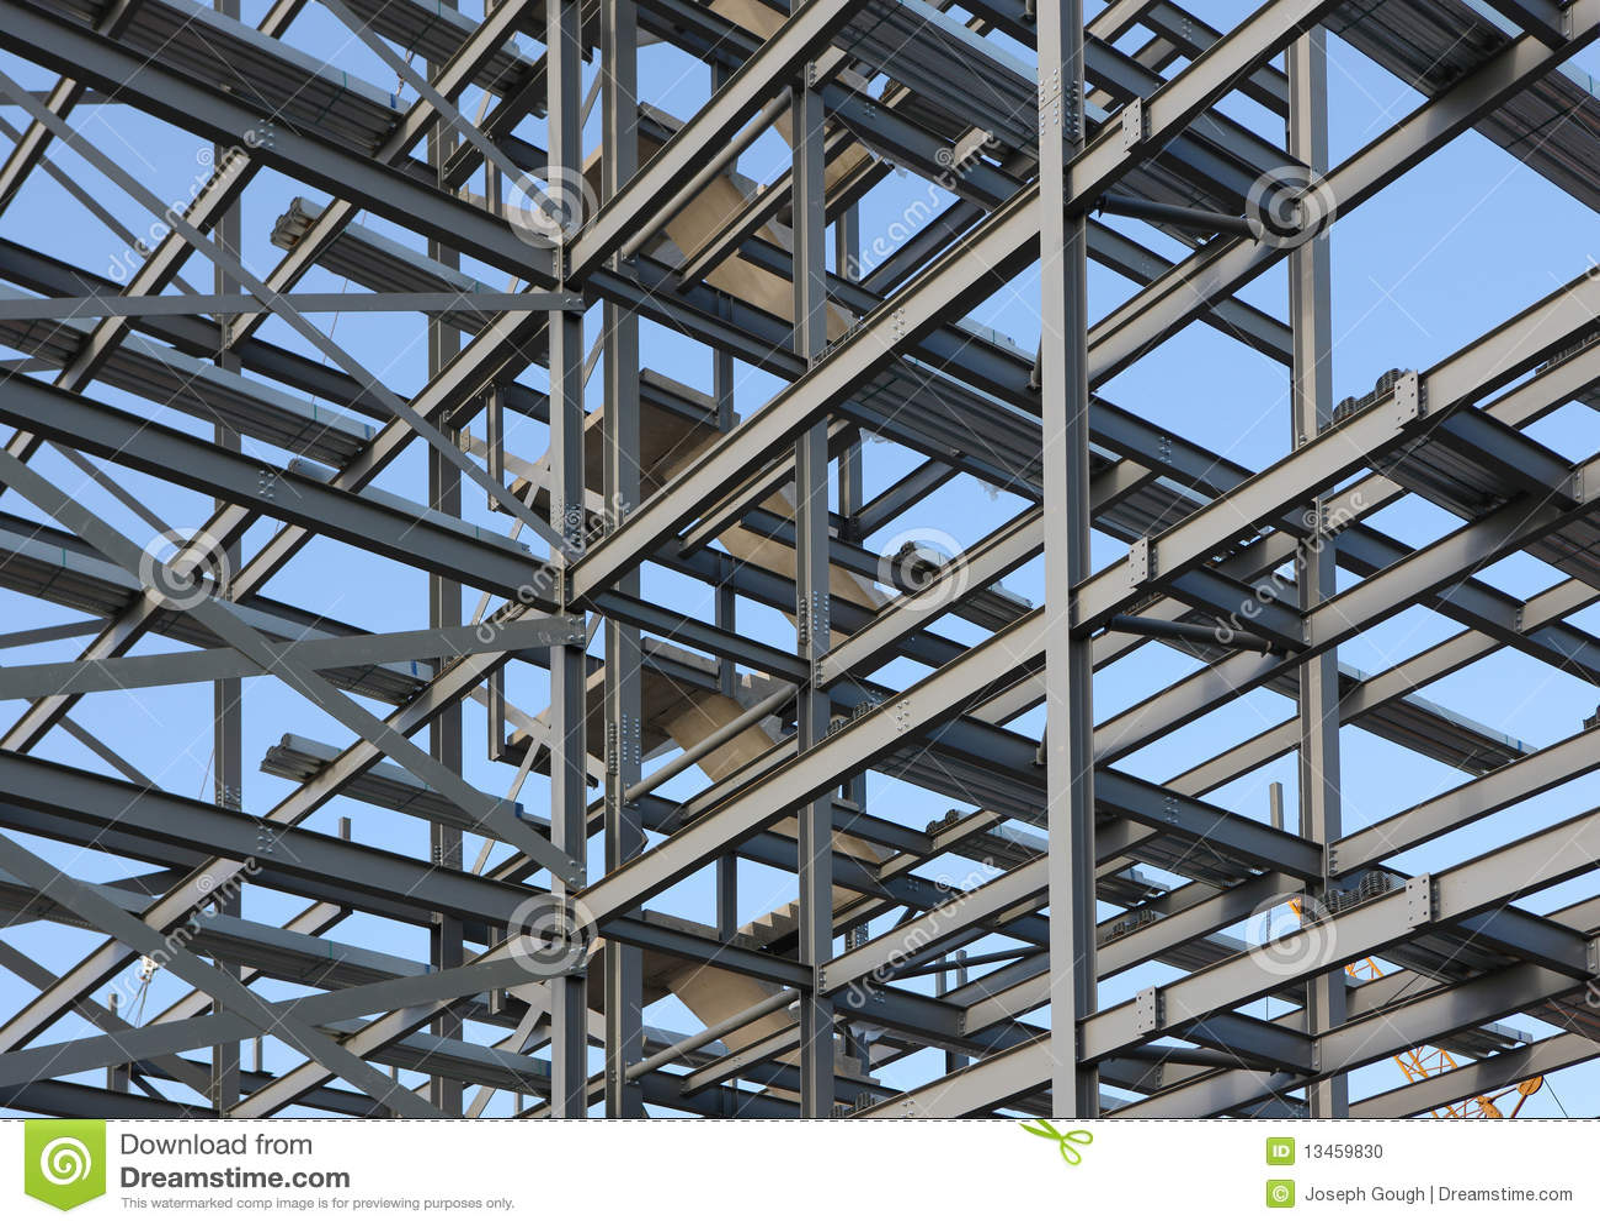 Marco de acero estructural foto de archivo. Imagen de outdoors ...